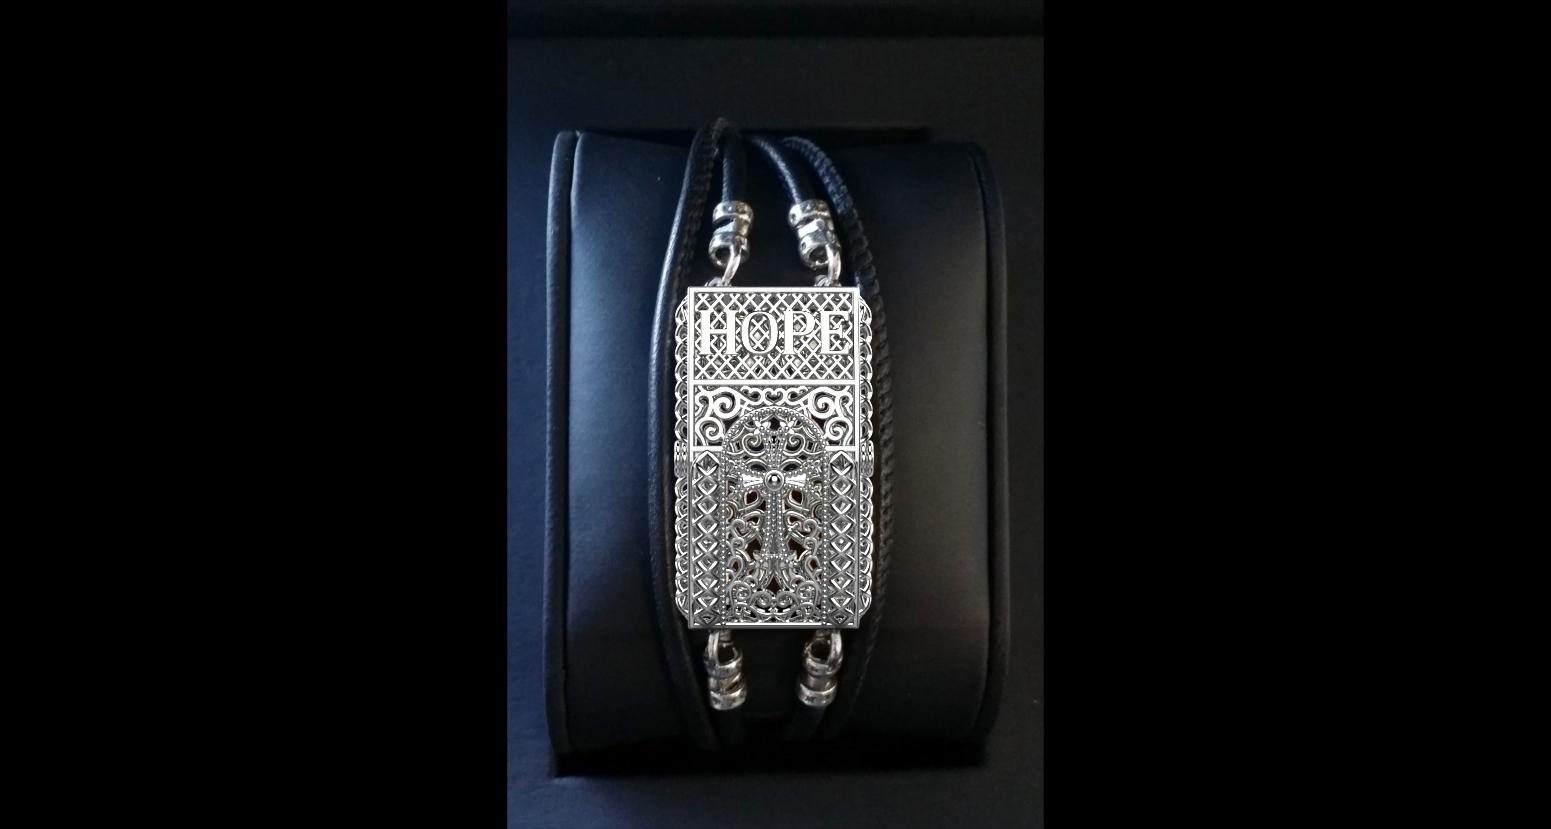 http://www.khachkarjewelry.com/